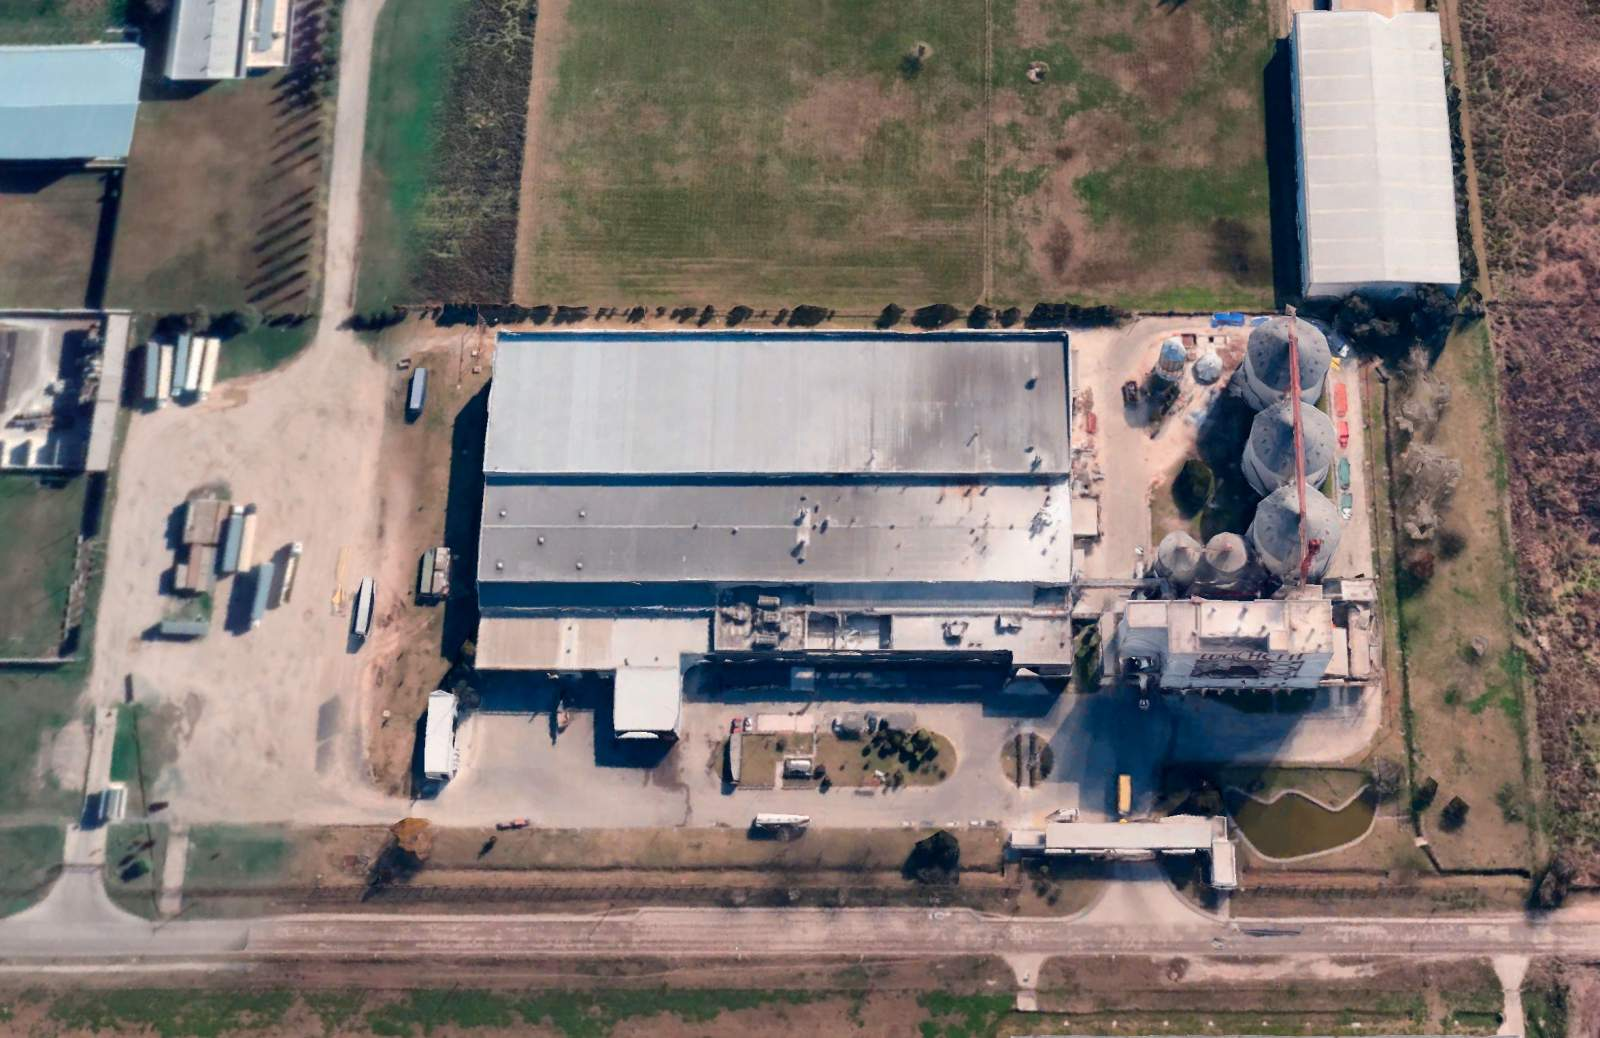 molinos-rio-de-la-plata-luchetti-2-proyecto-saxum-mineria-industria-construccion-empresas-ingenieria-argentina-litio-cementera